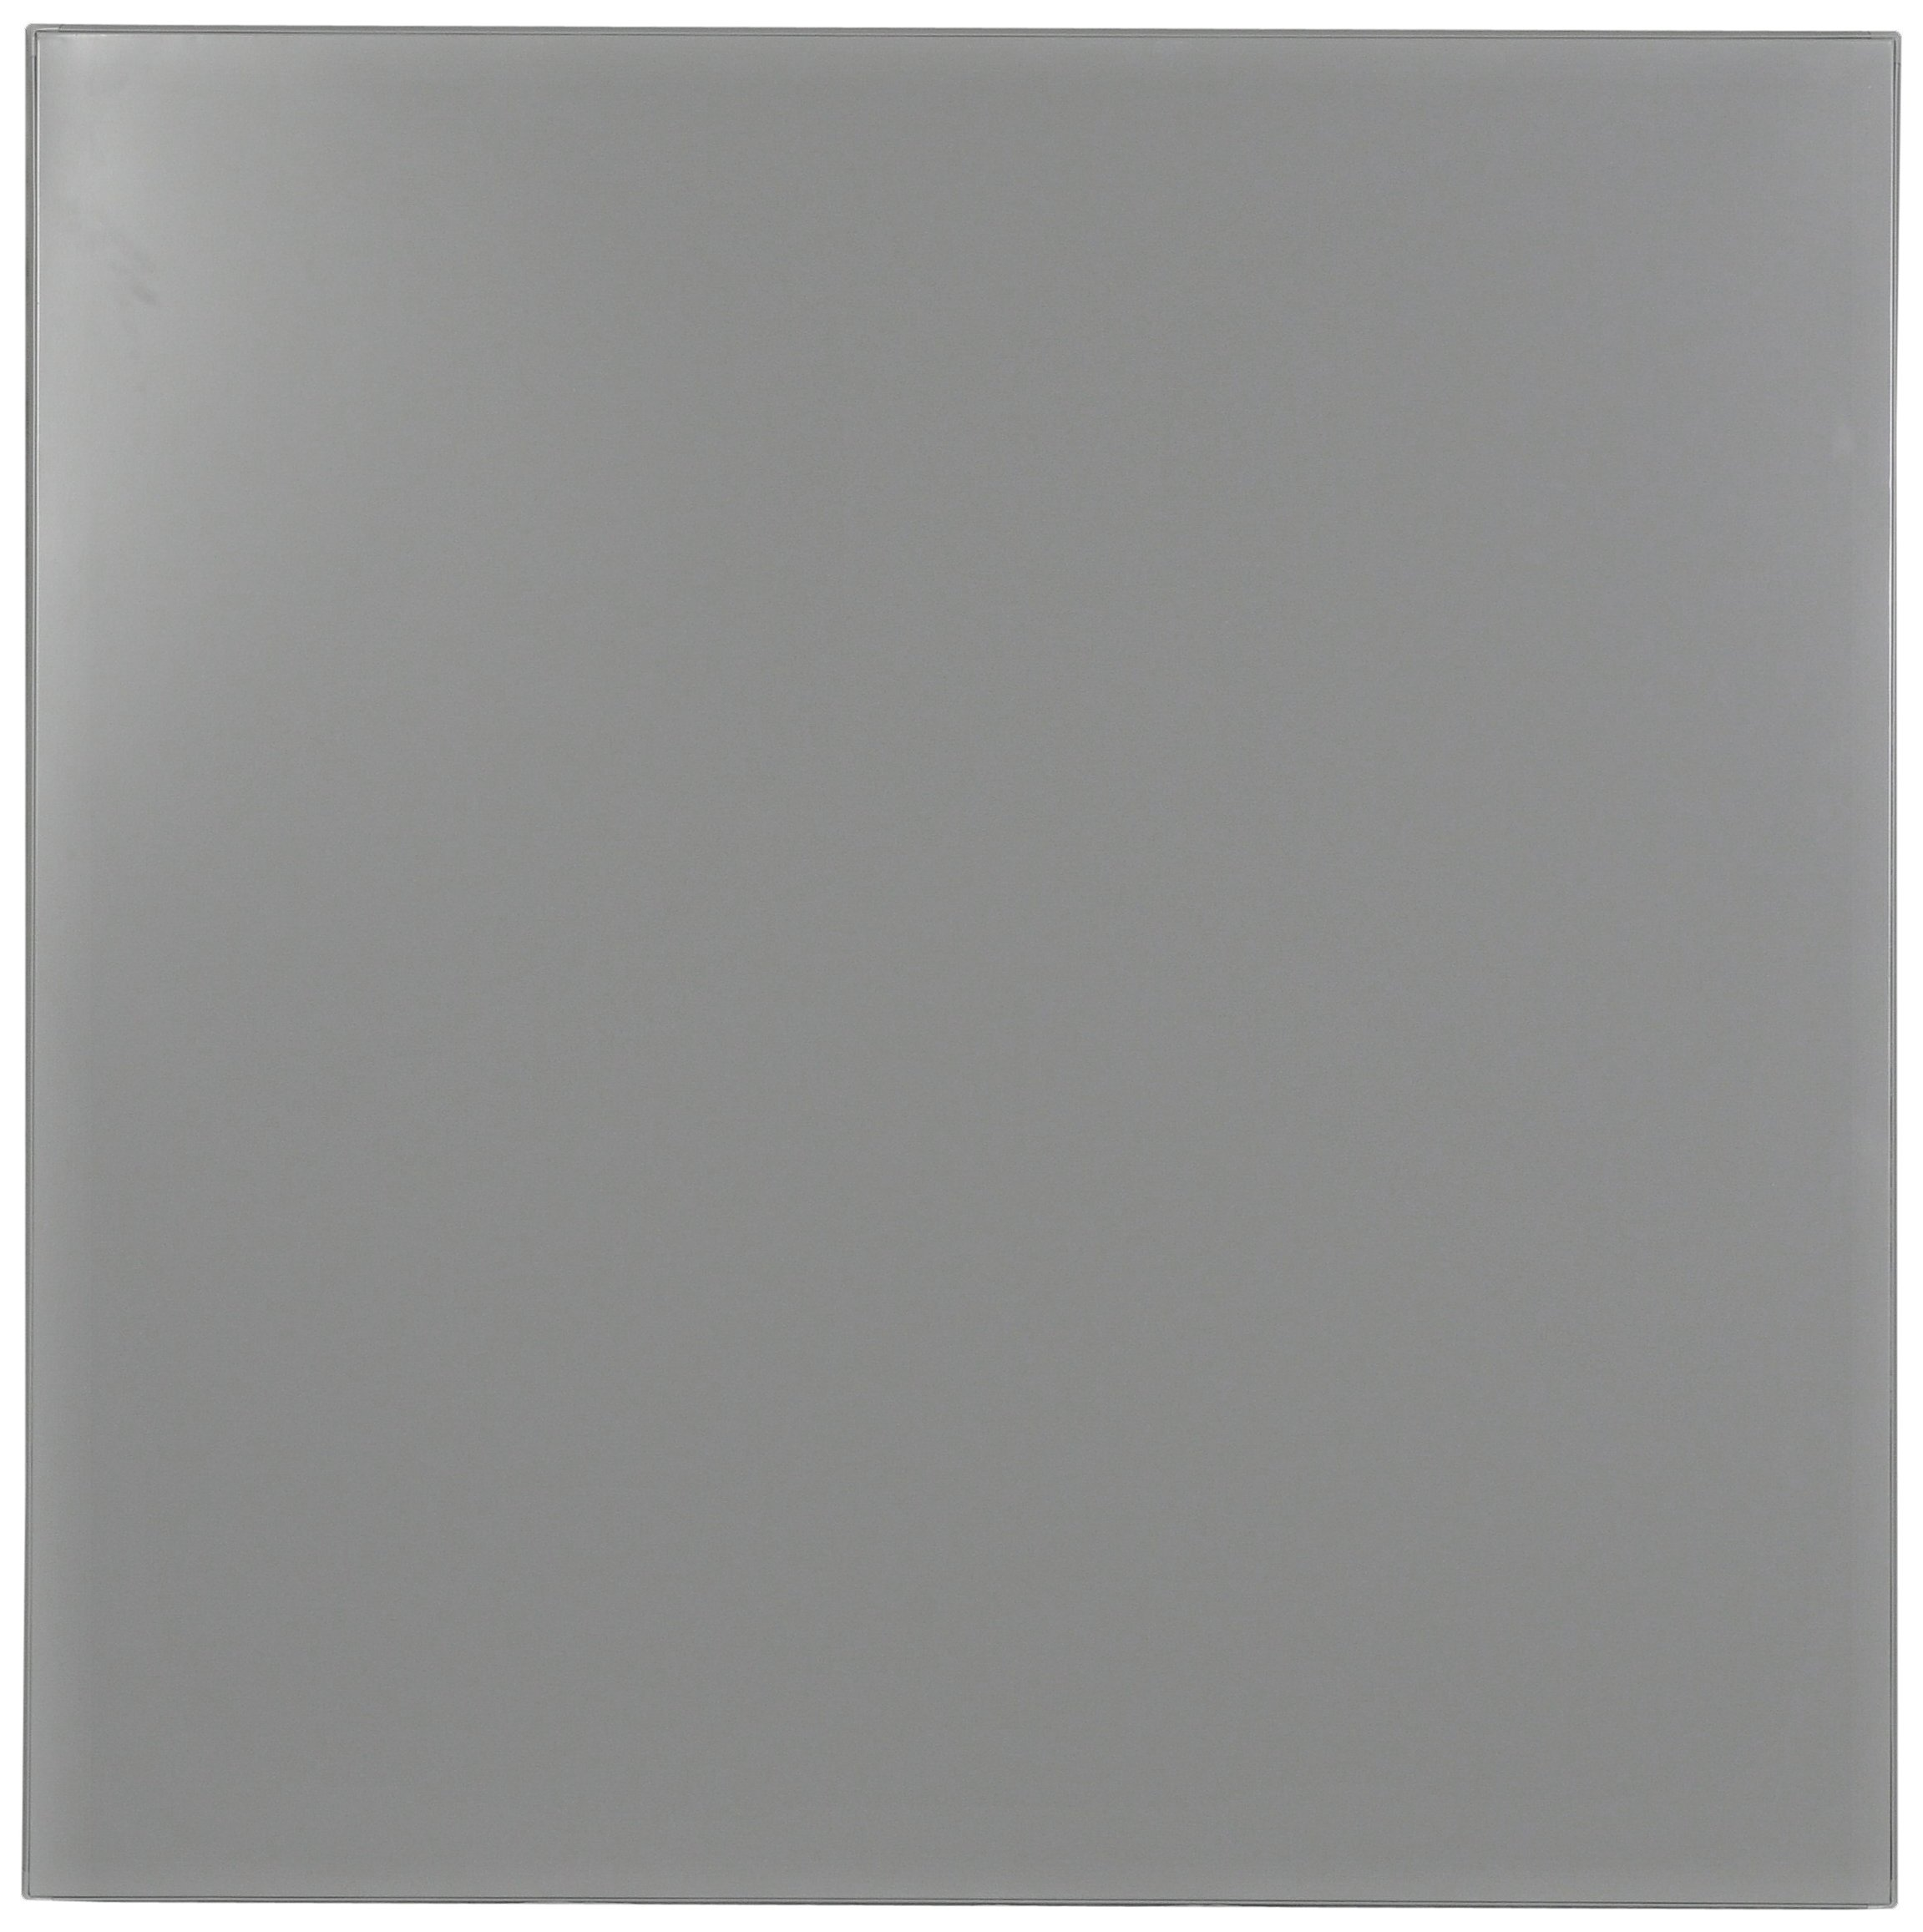 Sanymetal 1160SG Panel, 57 3/4'', Sany Grey